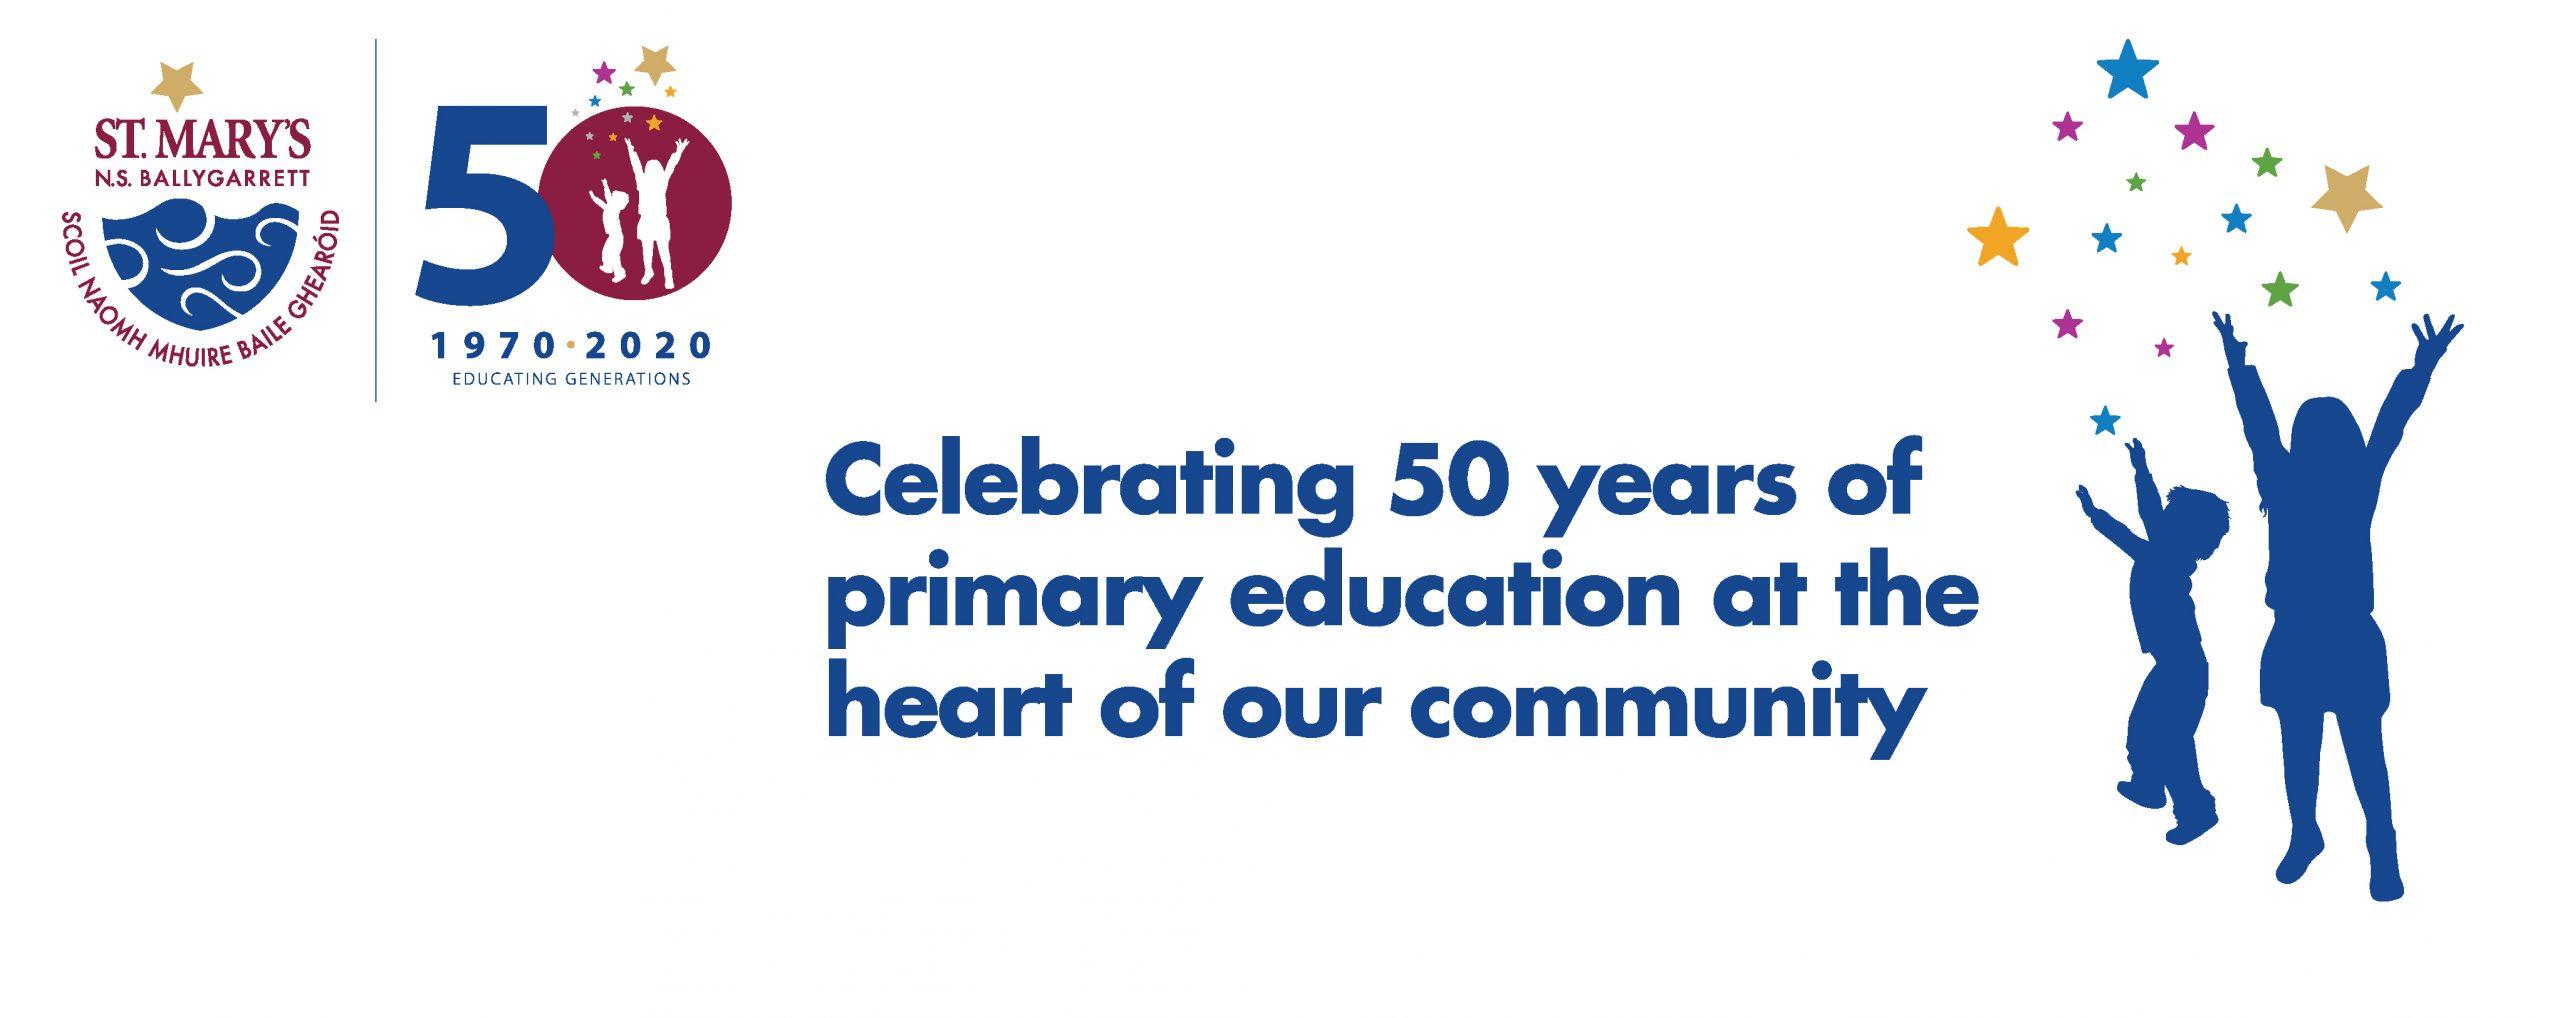 Jubilee 1970 2020   St. Mary'S Ns Ballygarrett Regarding William And Mary School Calendar 2021 2020